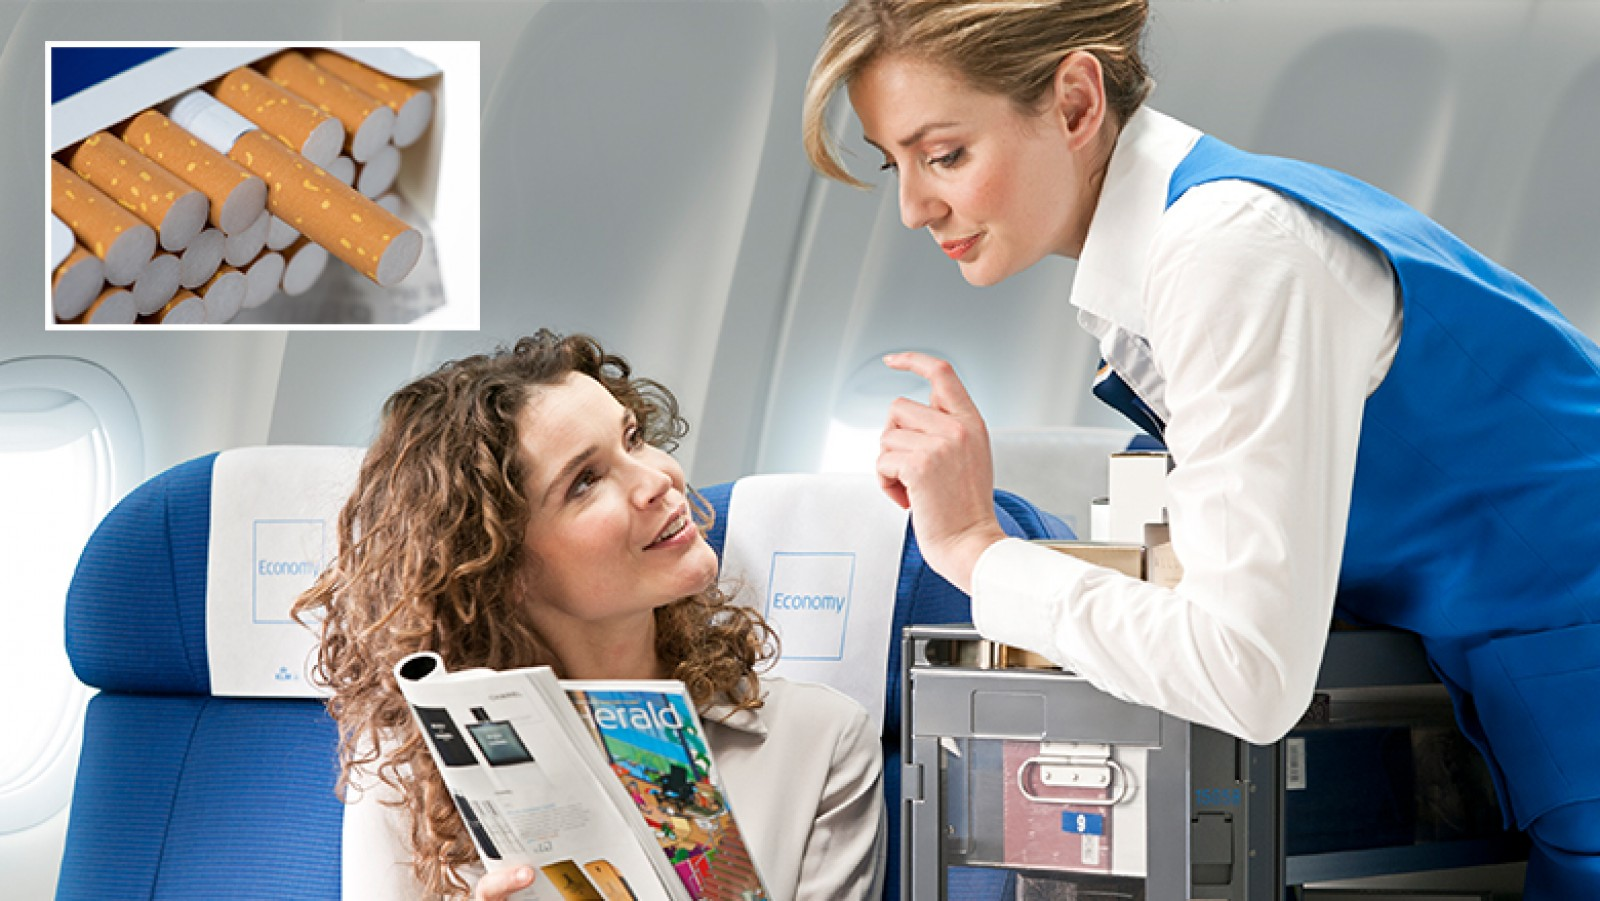 KLM / Shutterstock / Beeldbewerking NH